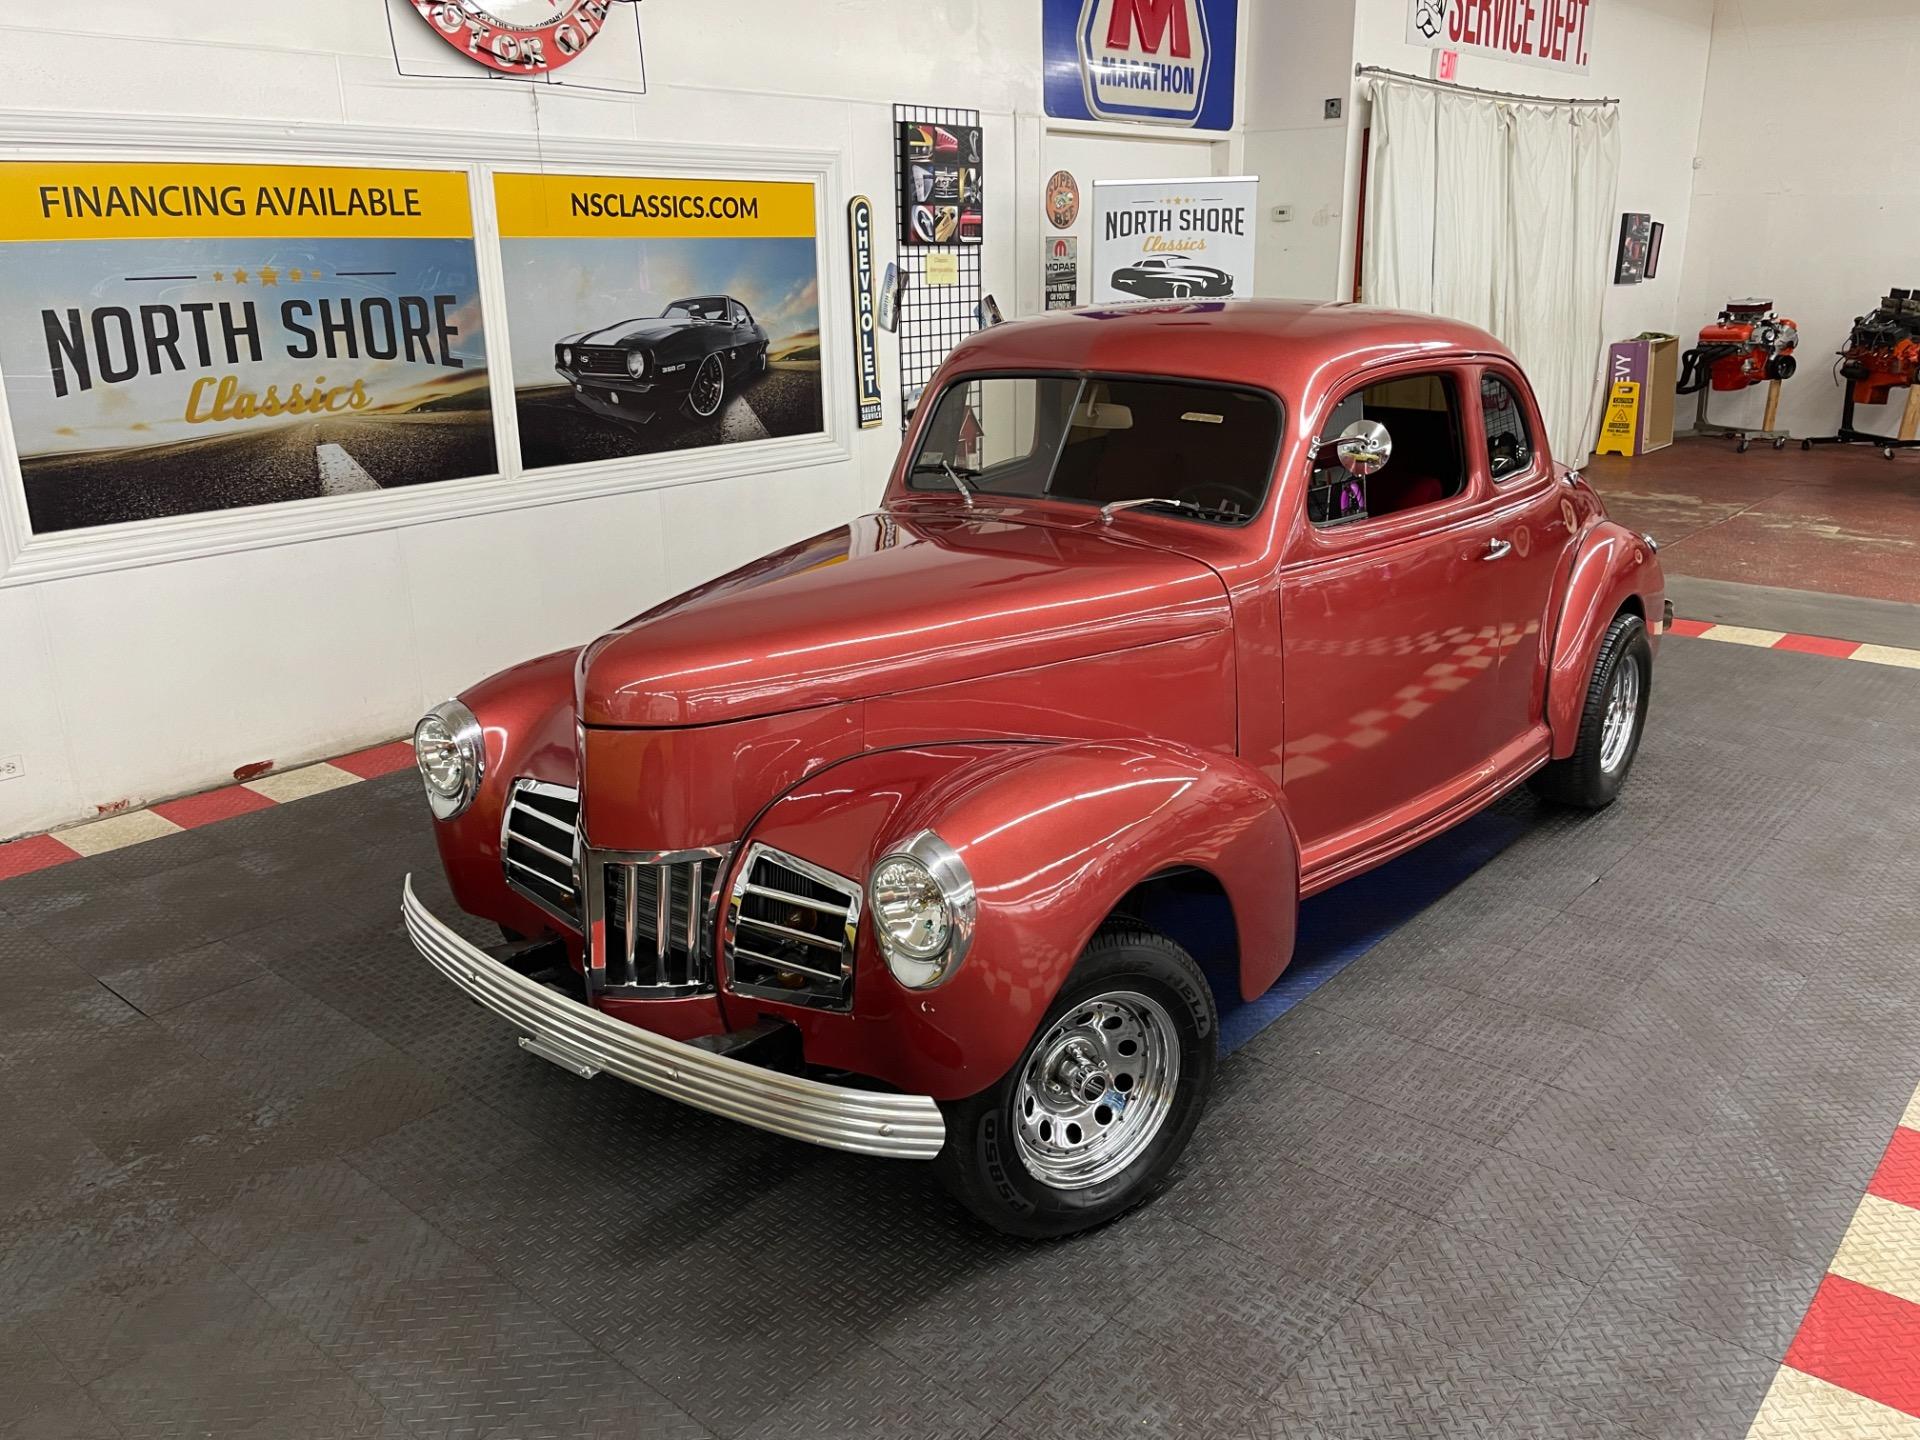 Used 1939 Studebaker Hot Rod / Street Rod - COMPLETE MECHANICAL RESTORATION -  NICE DRIVER - SEE VIDEO | Mundelein, IL